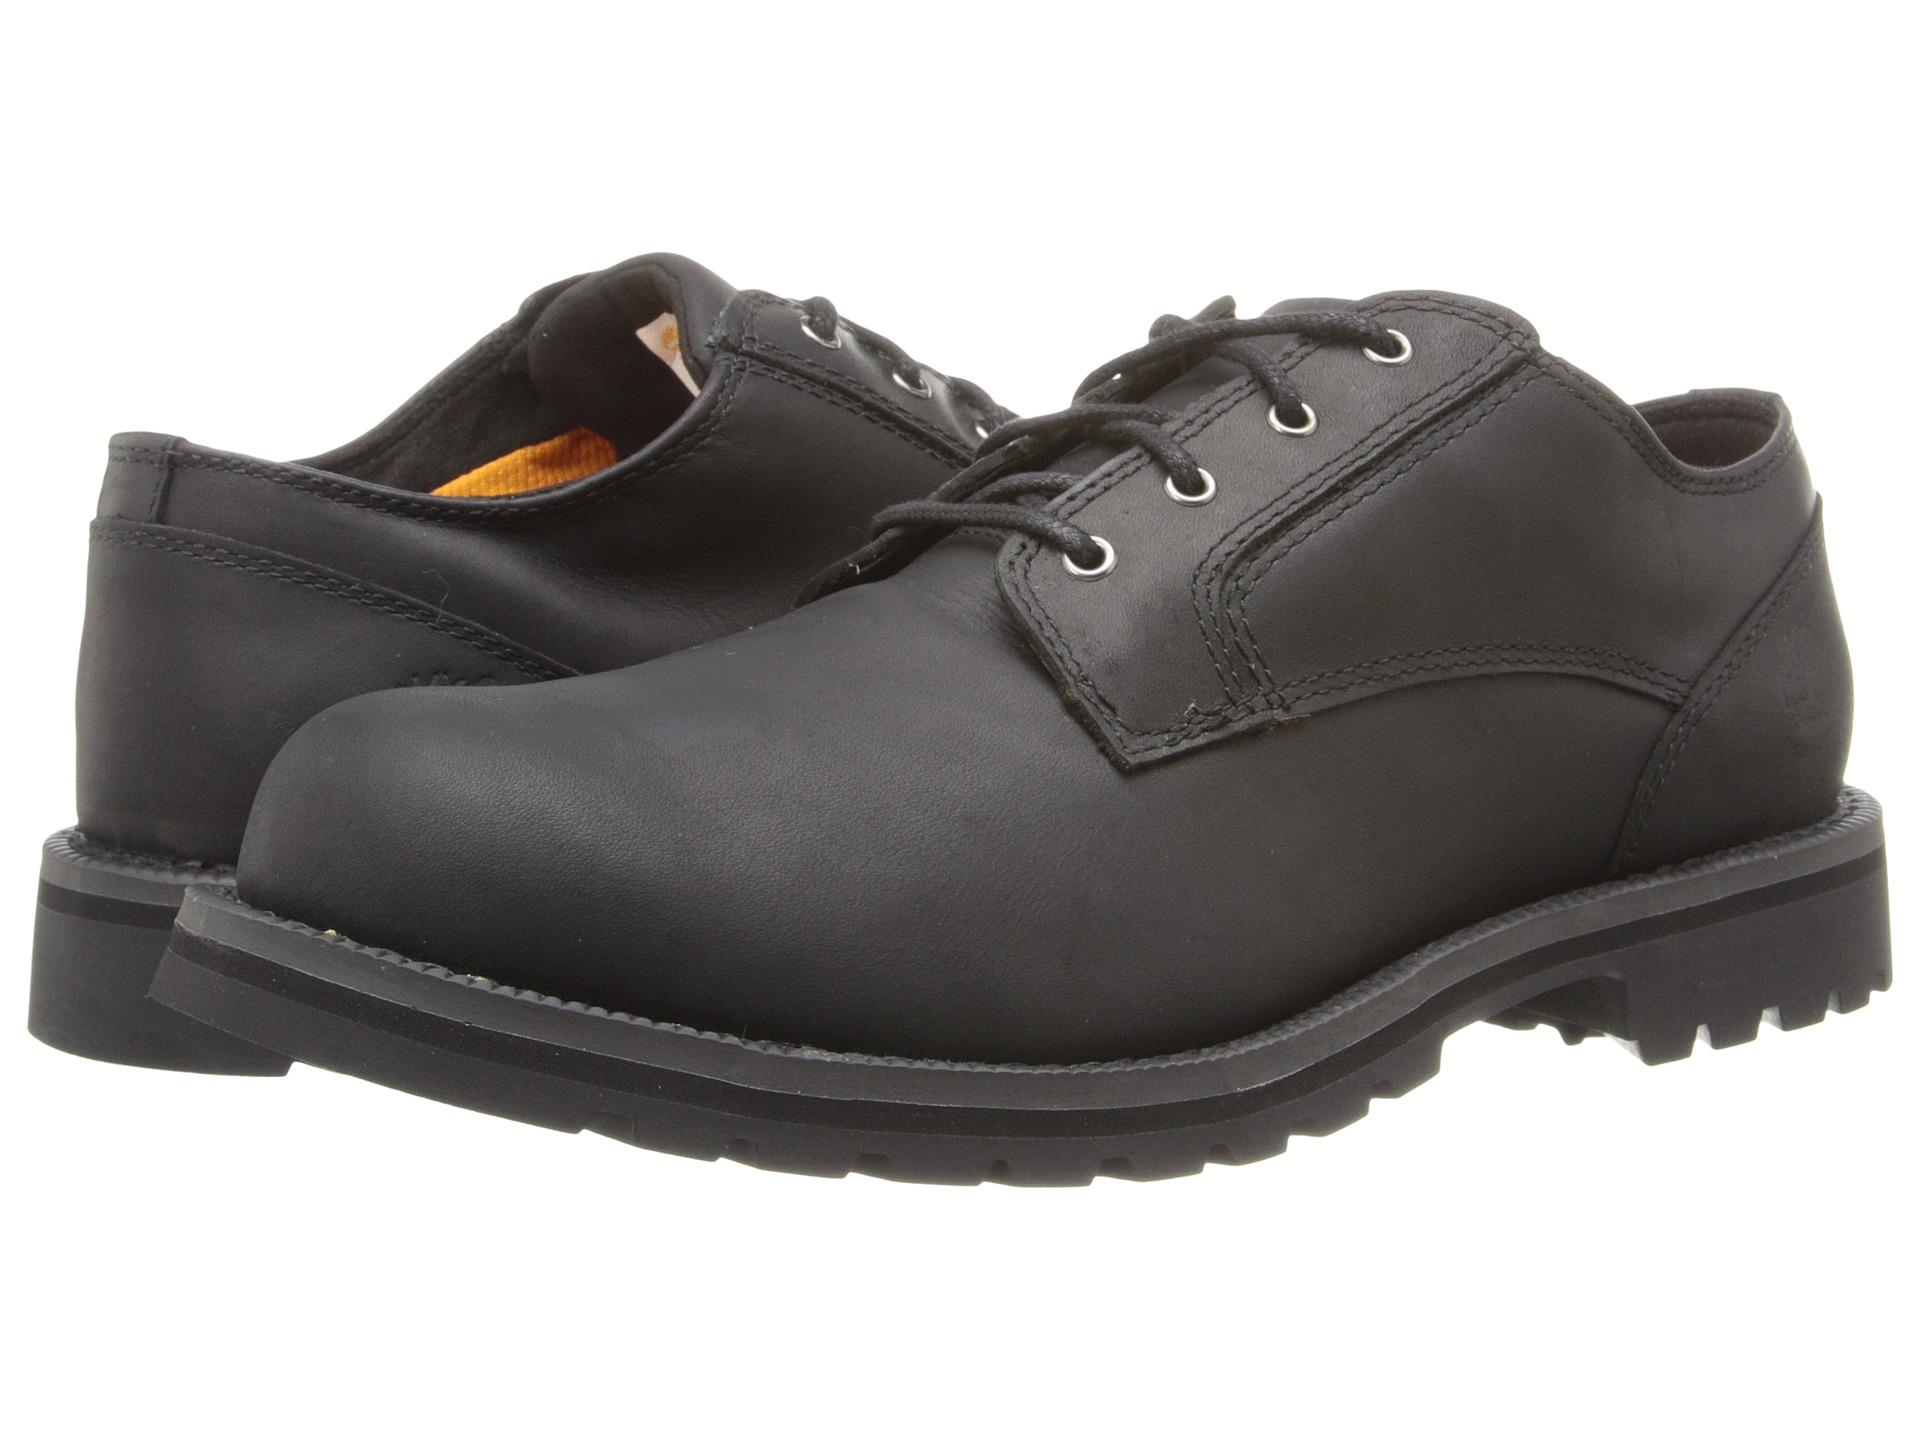 timberland earthkeepers shoes waterproof